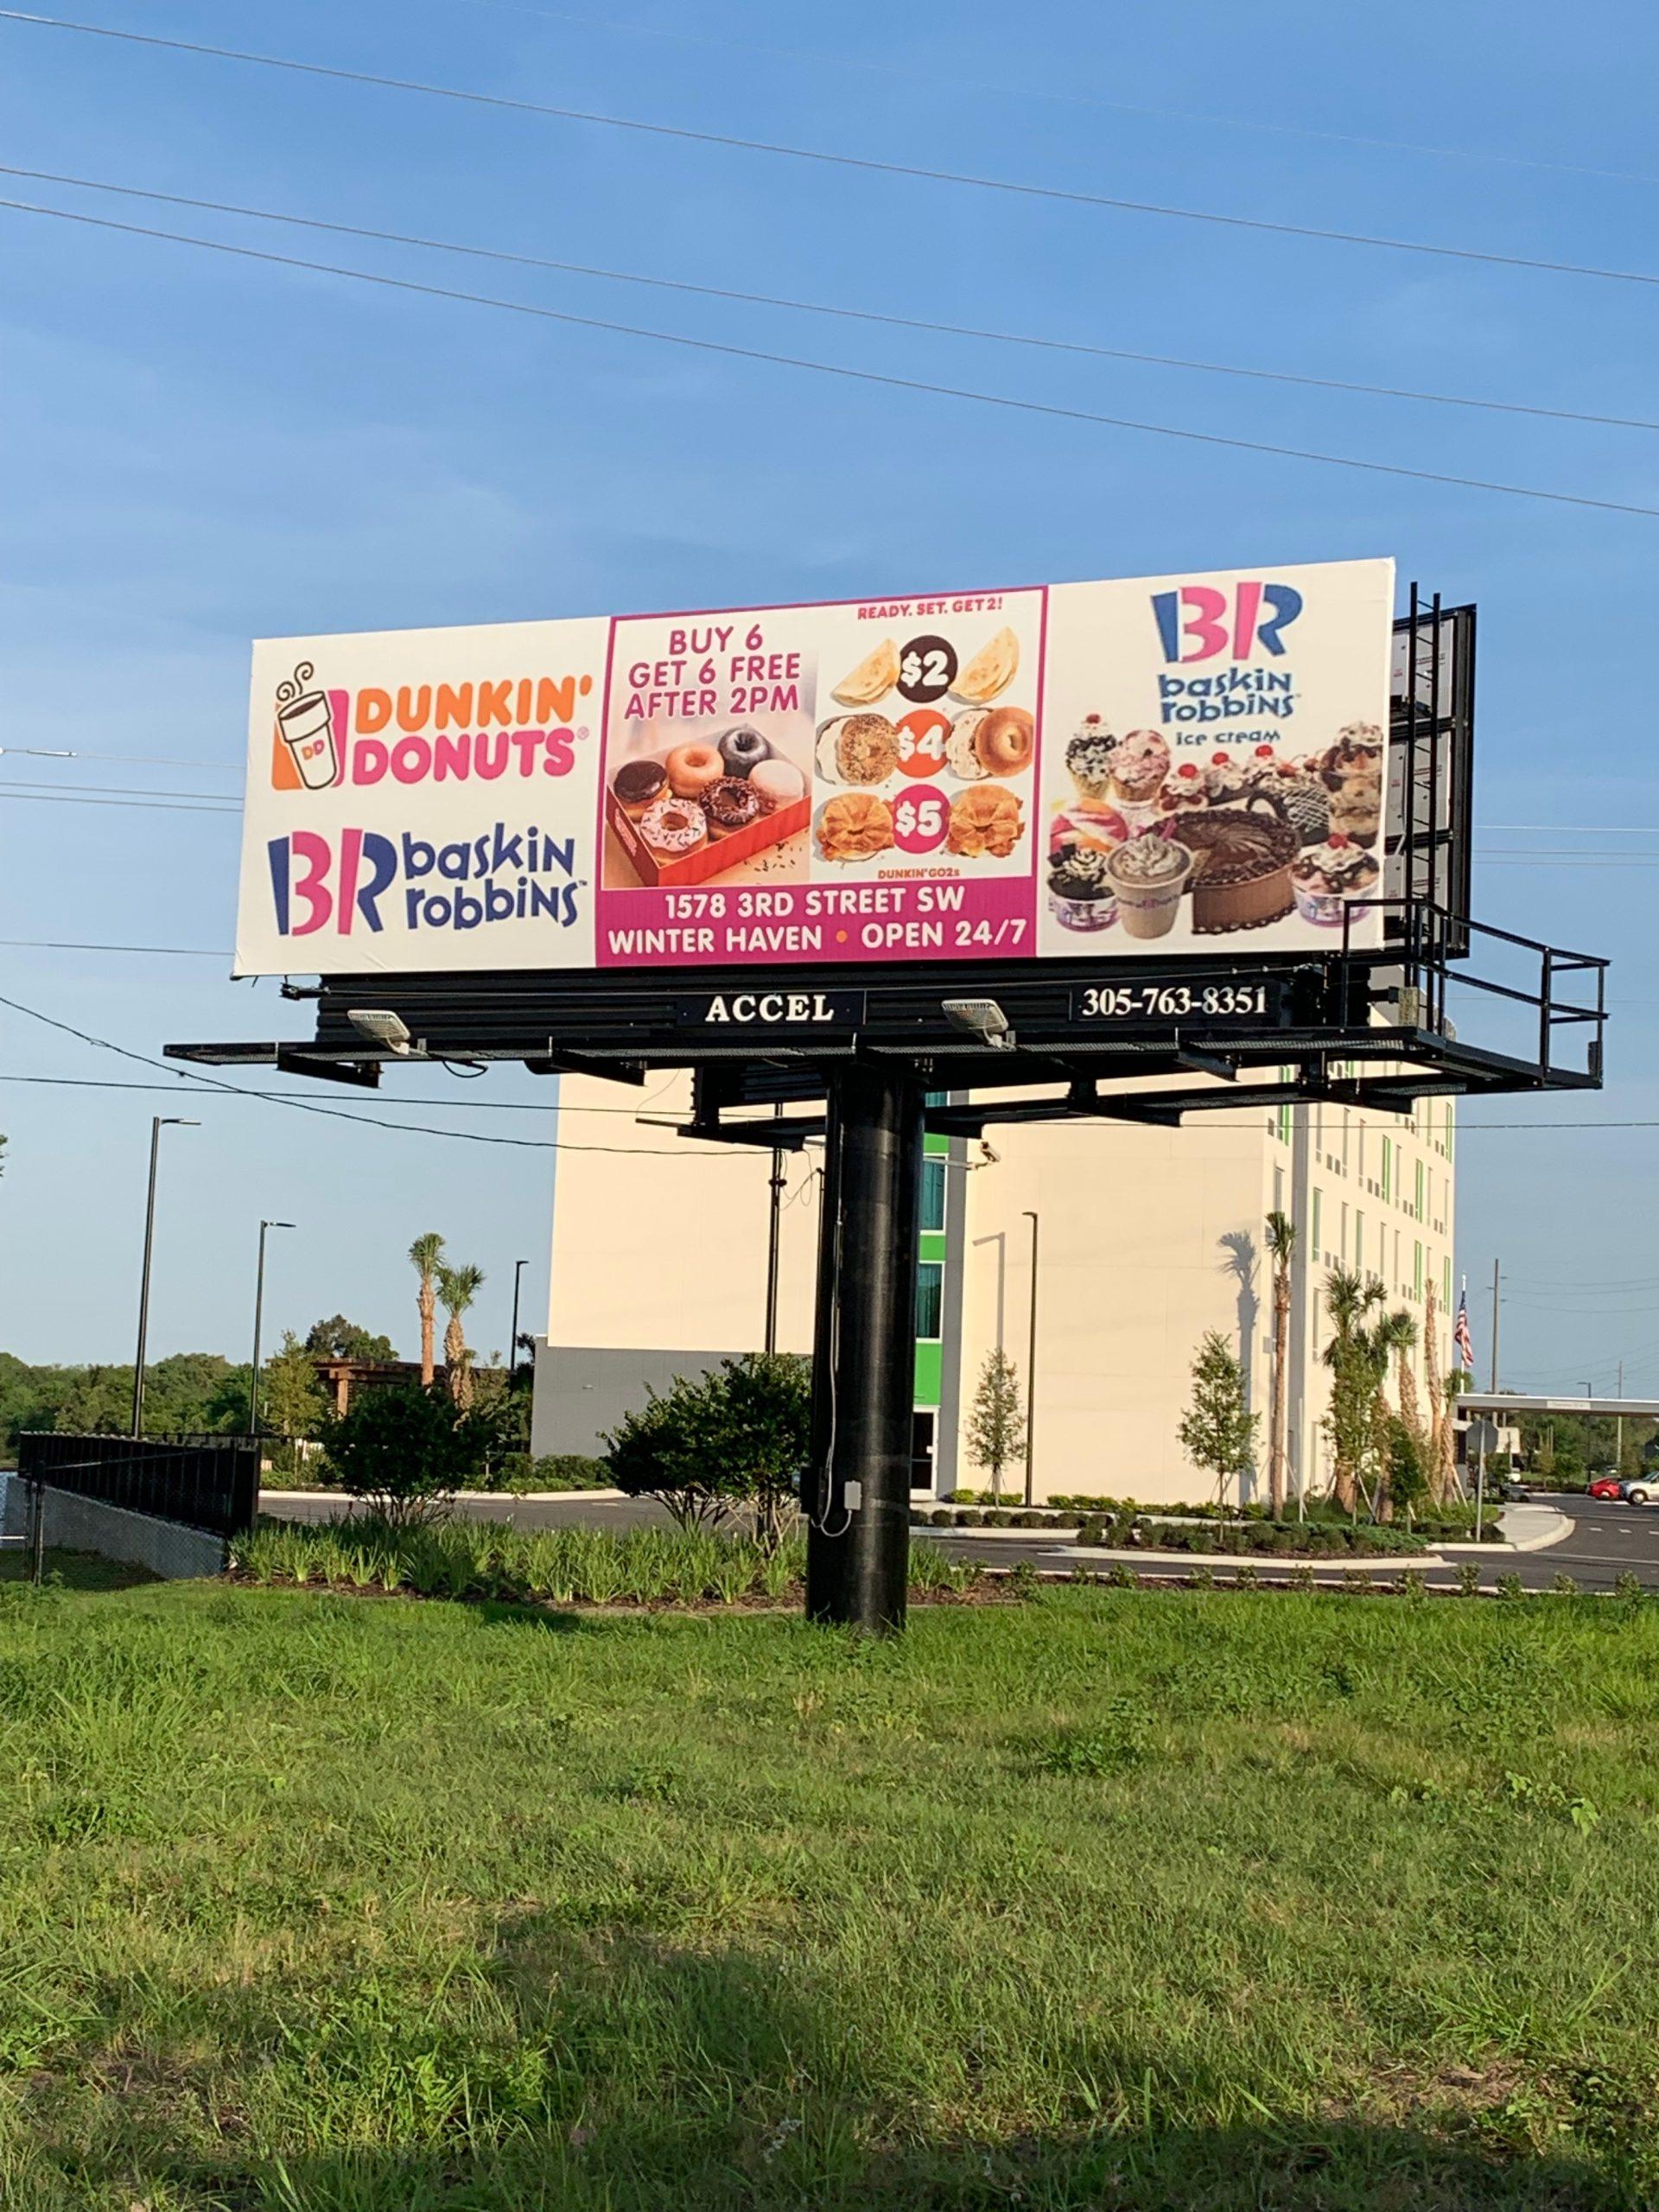 Outdoor-Advertising-Sign #154.12 LHR - PoP -- 3-14-19